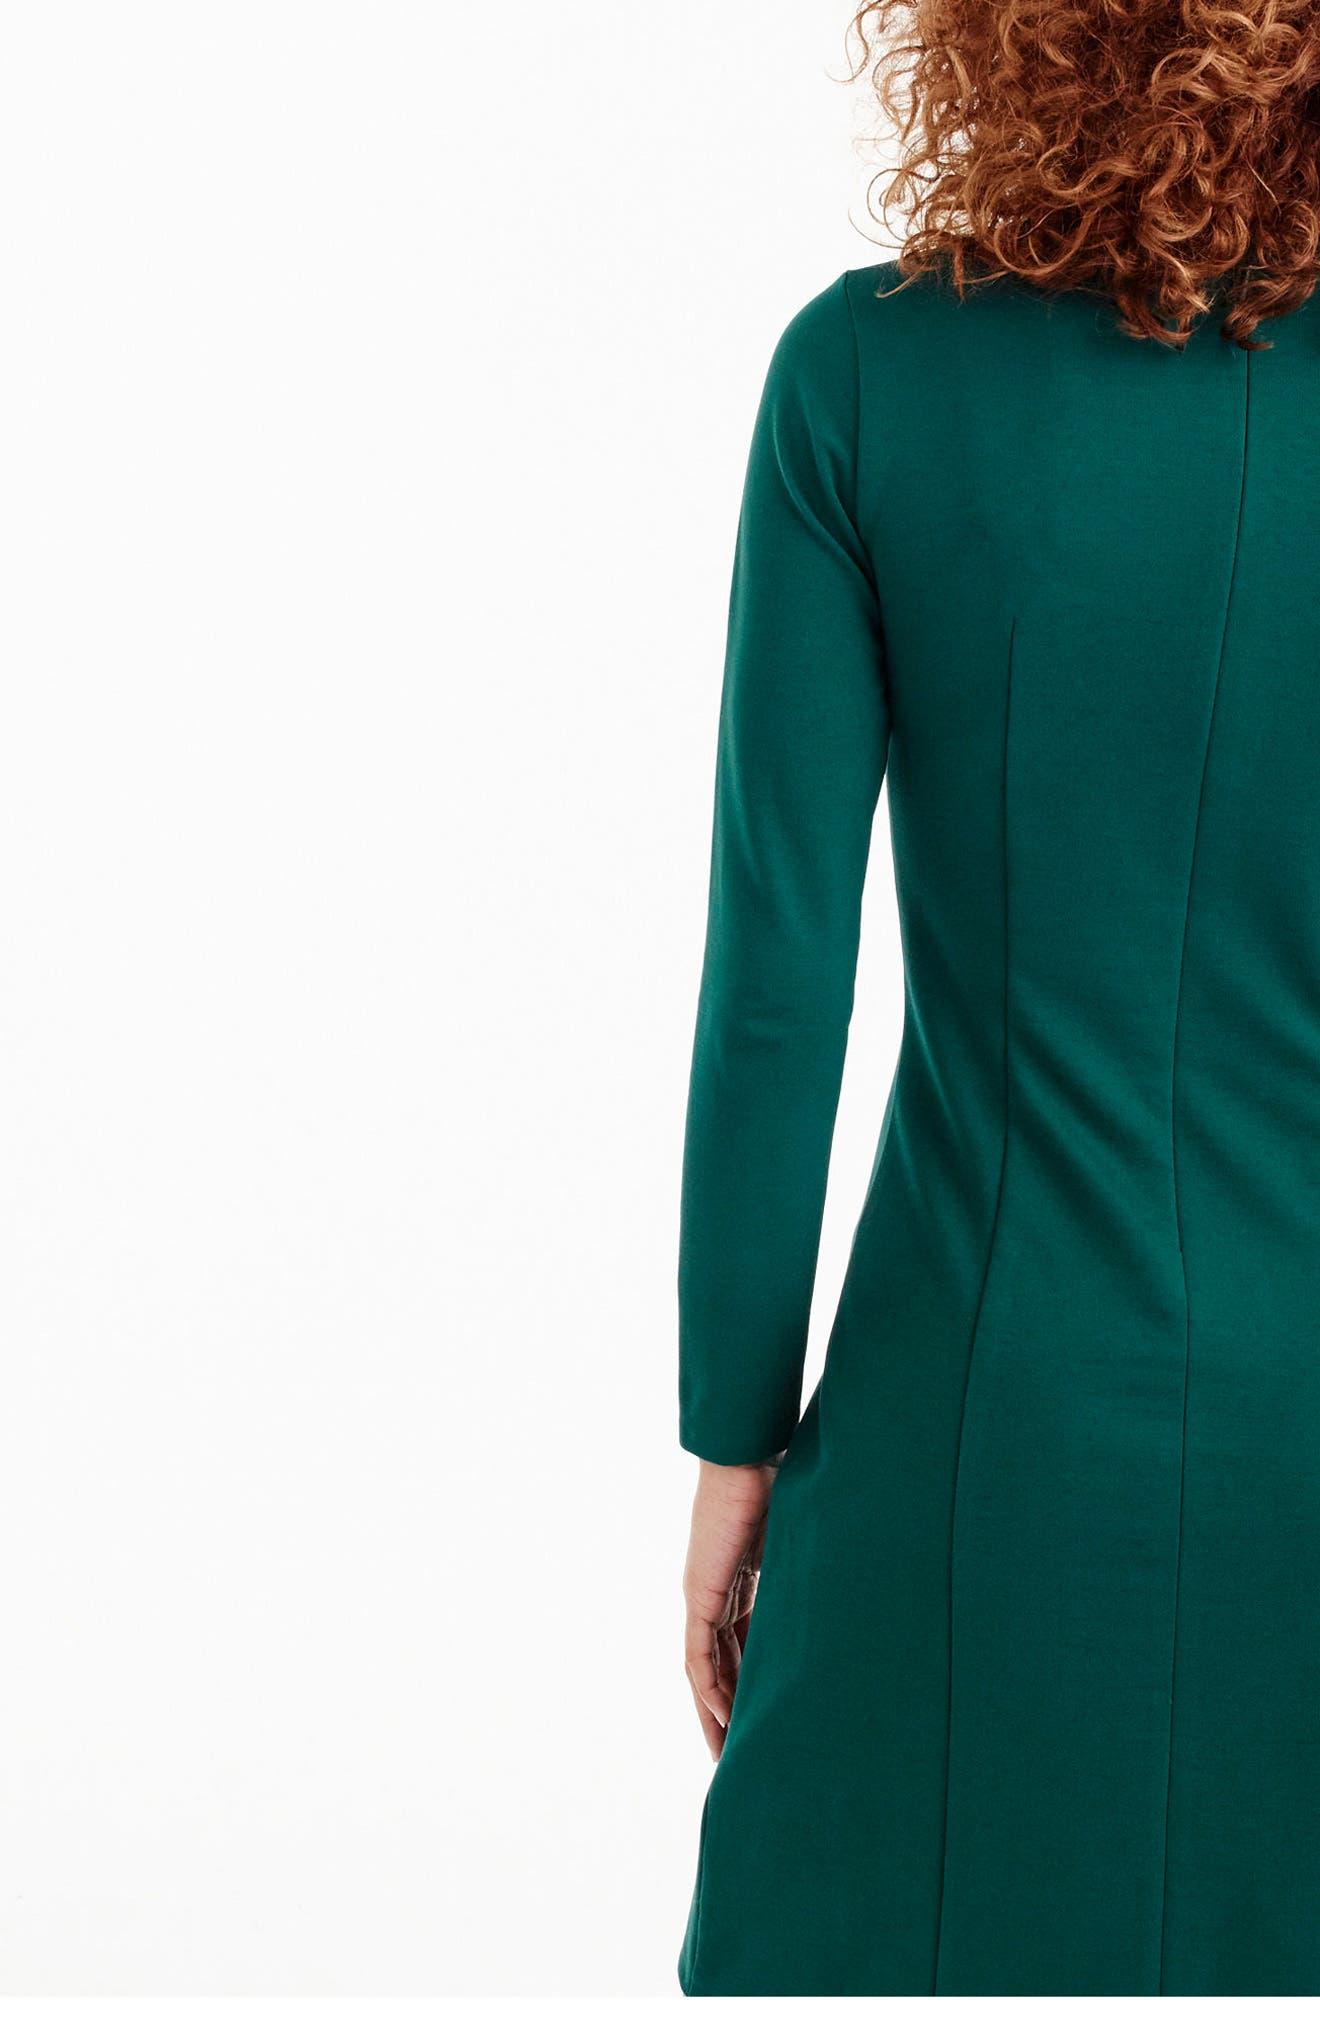 Storm Ponte Knit Dress,                             Alternate thumbnail 8, color,